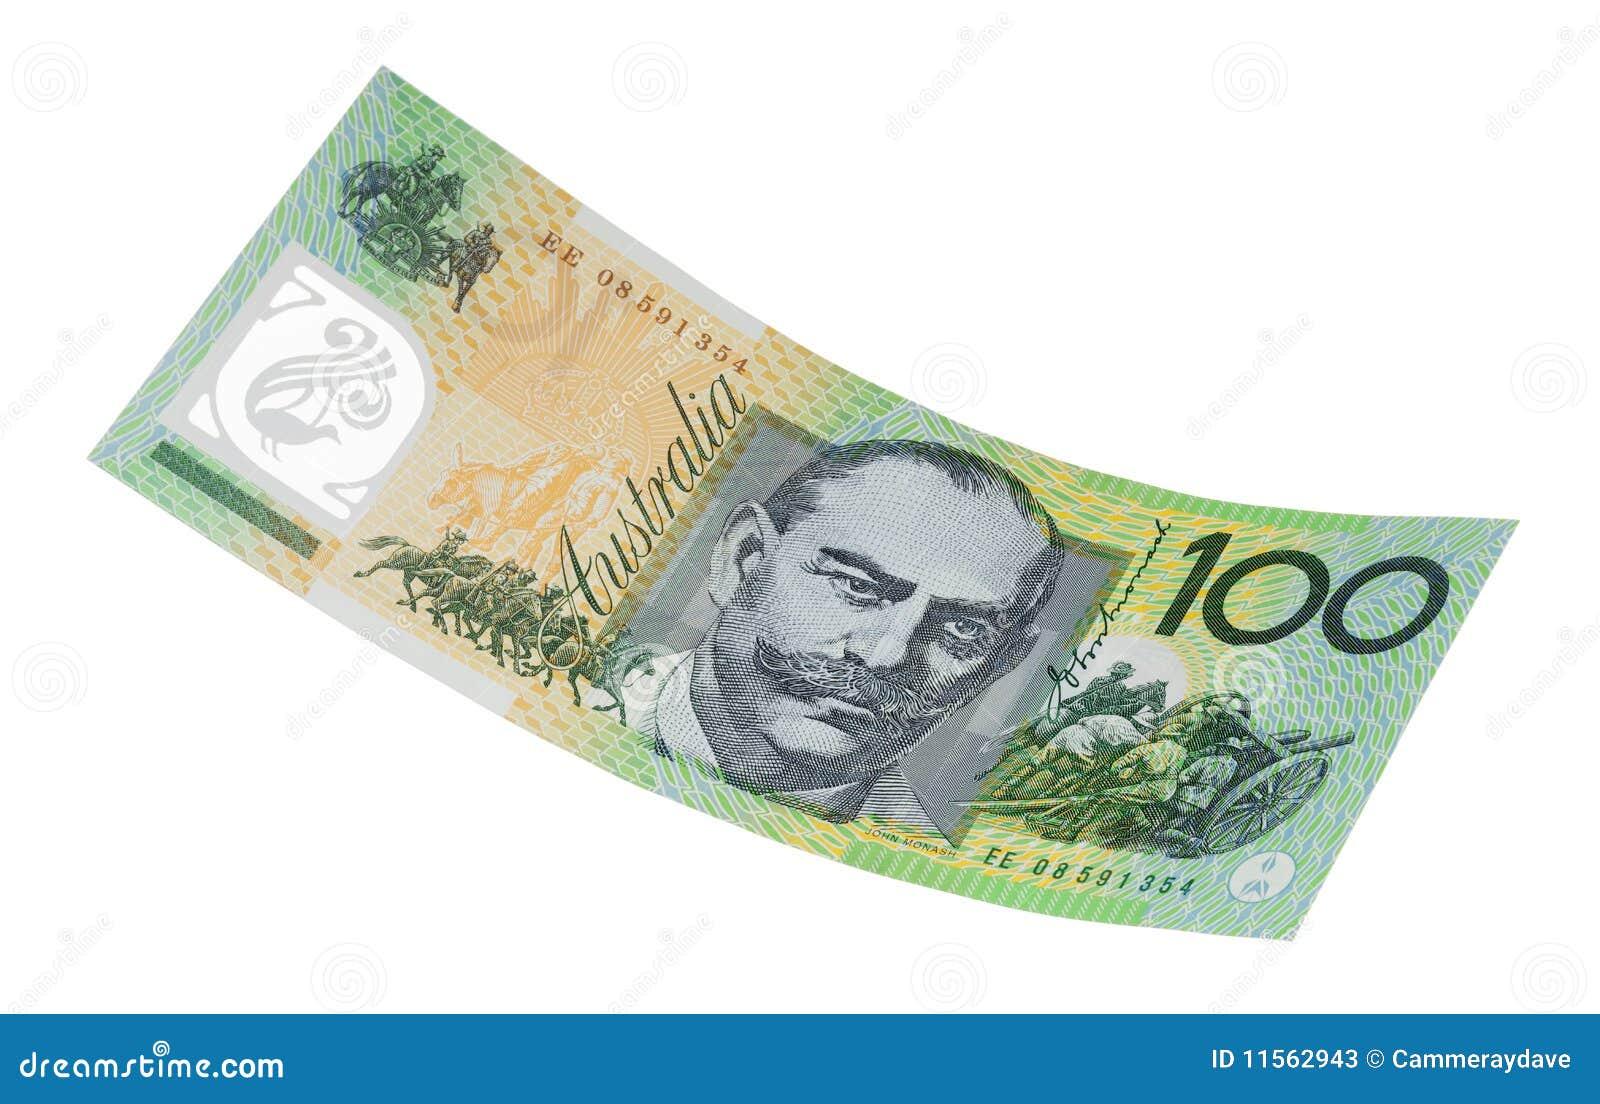 Australian One Hundred Dollar Note Isolated Stock Photos ...